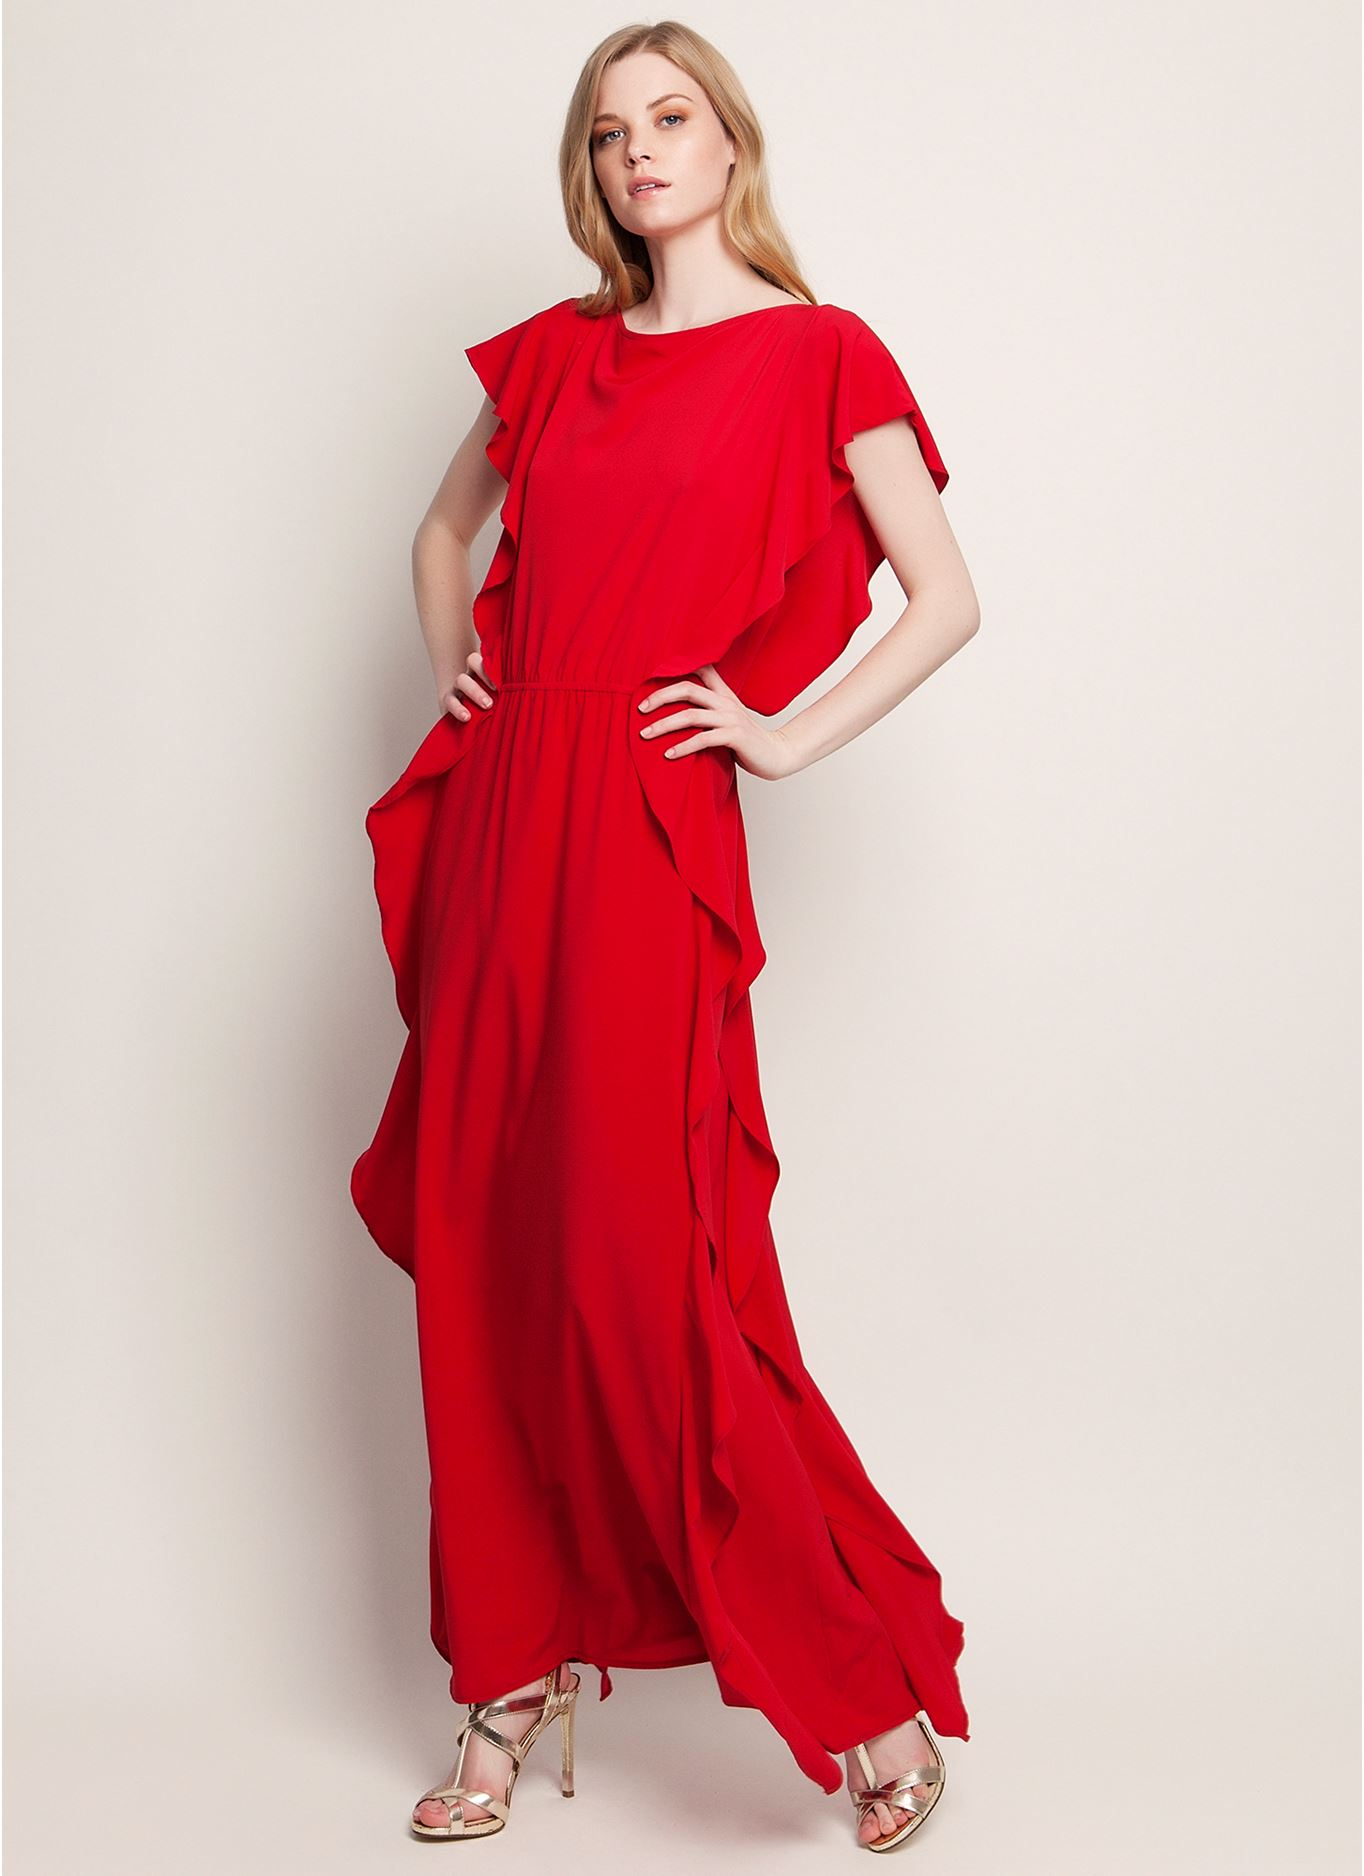 Red Sunday Dresses